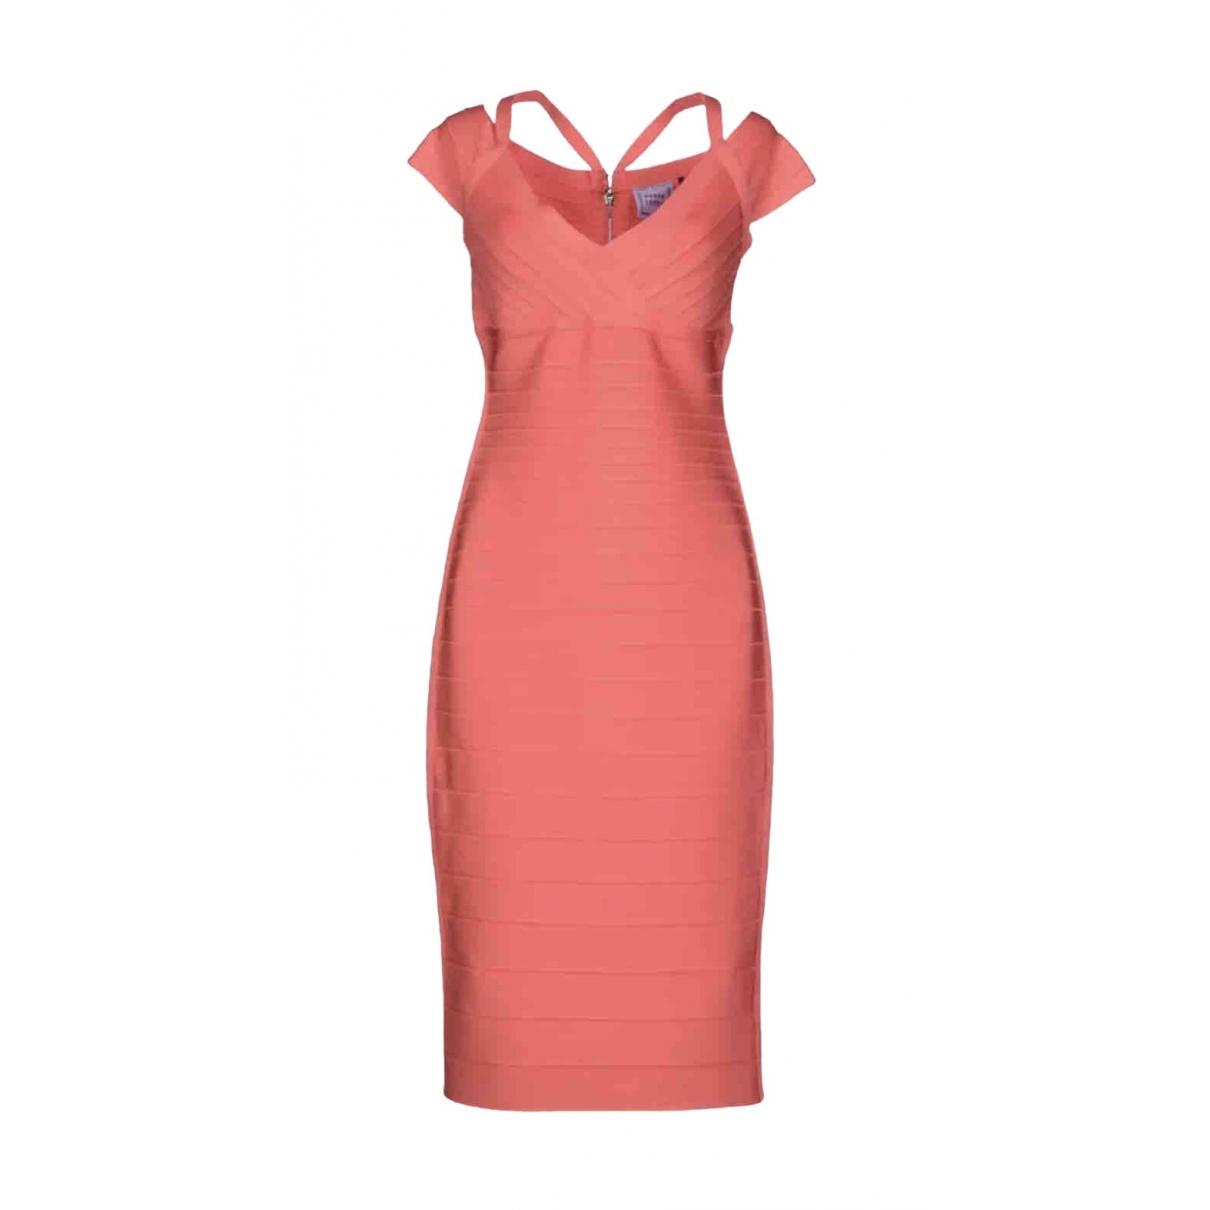 Herve Leger \N Purple dress for Women M International